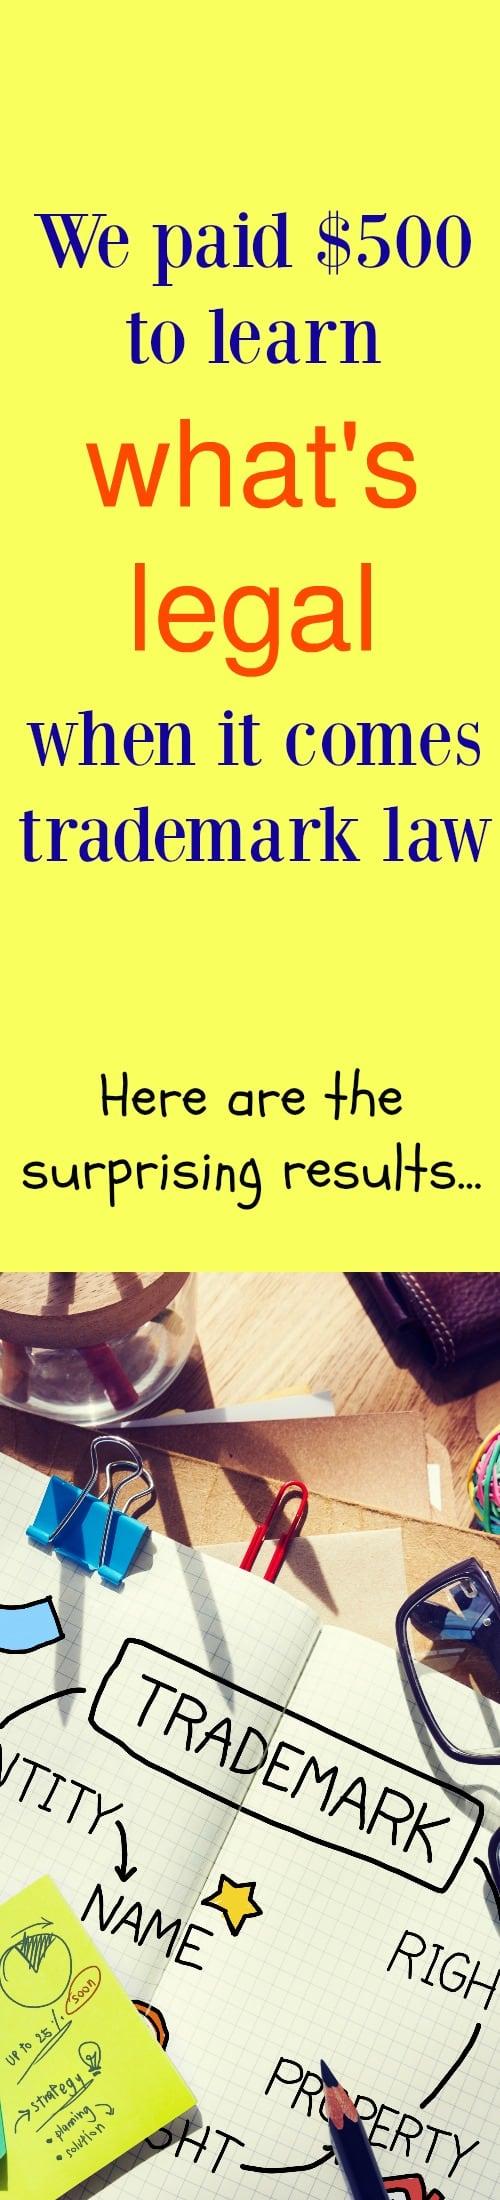 Trademark law advice